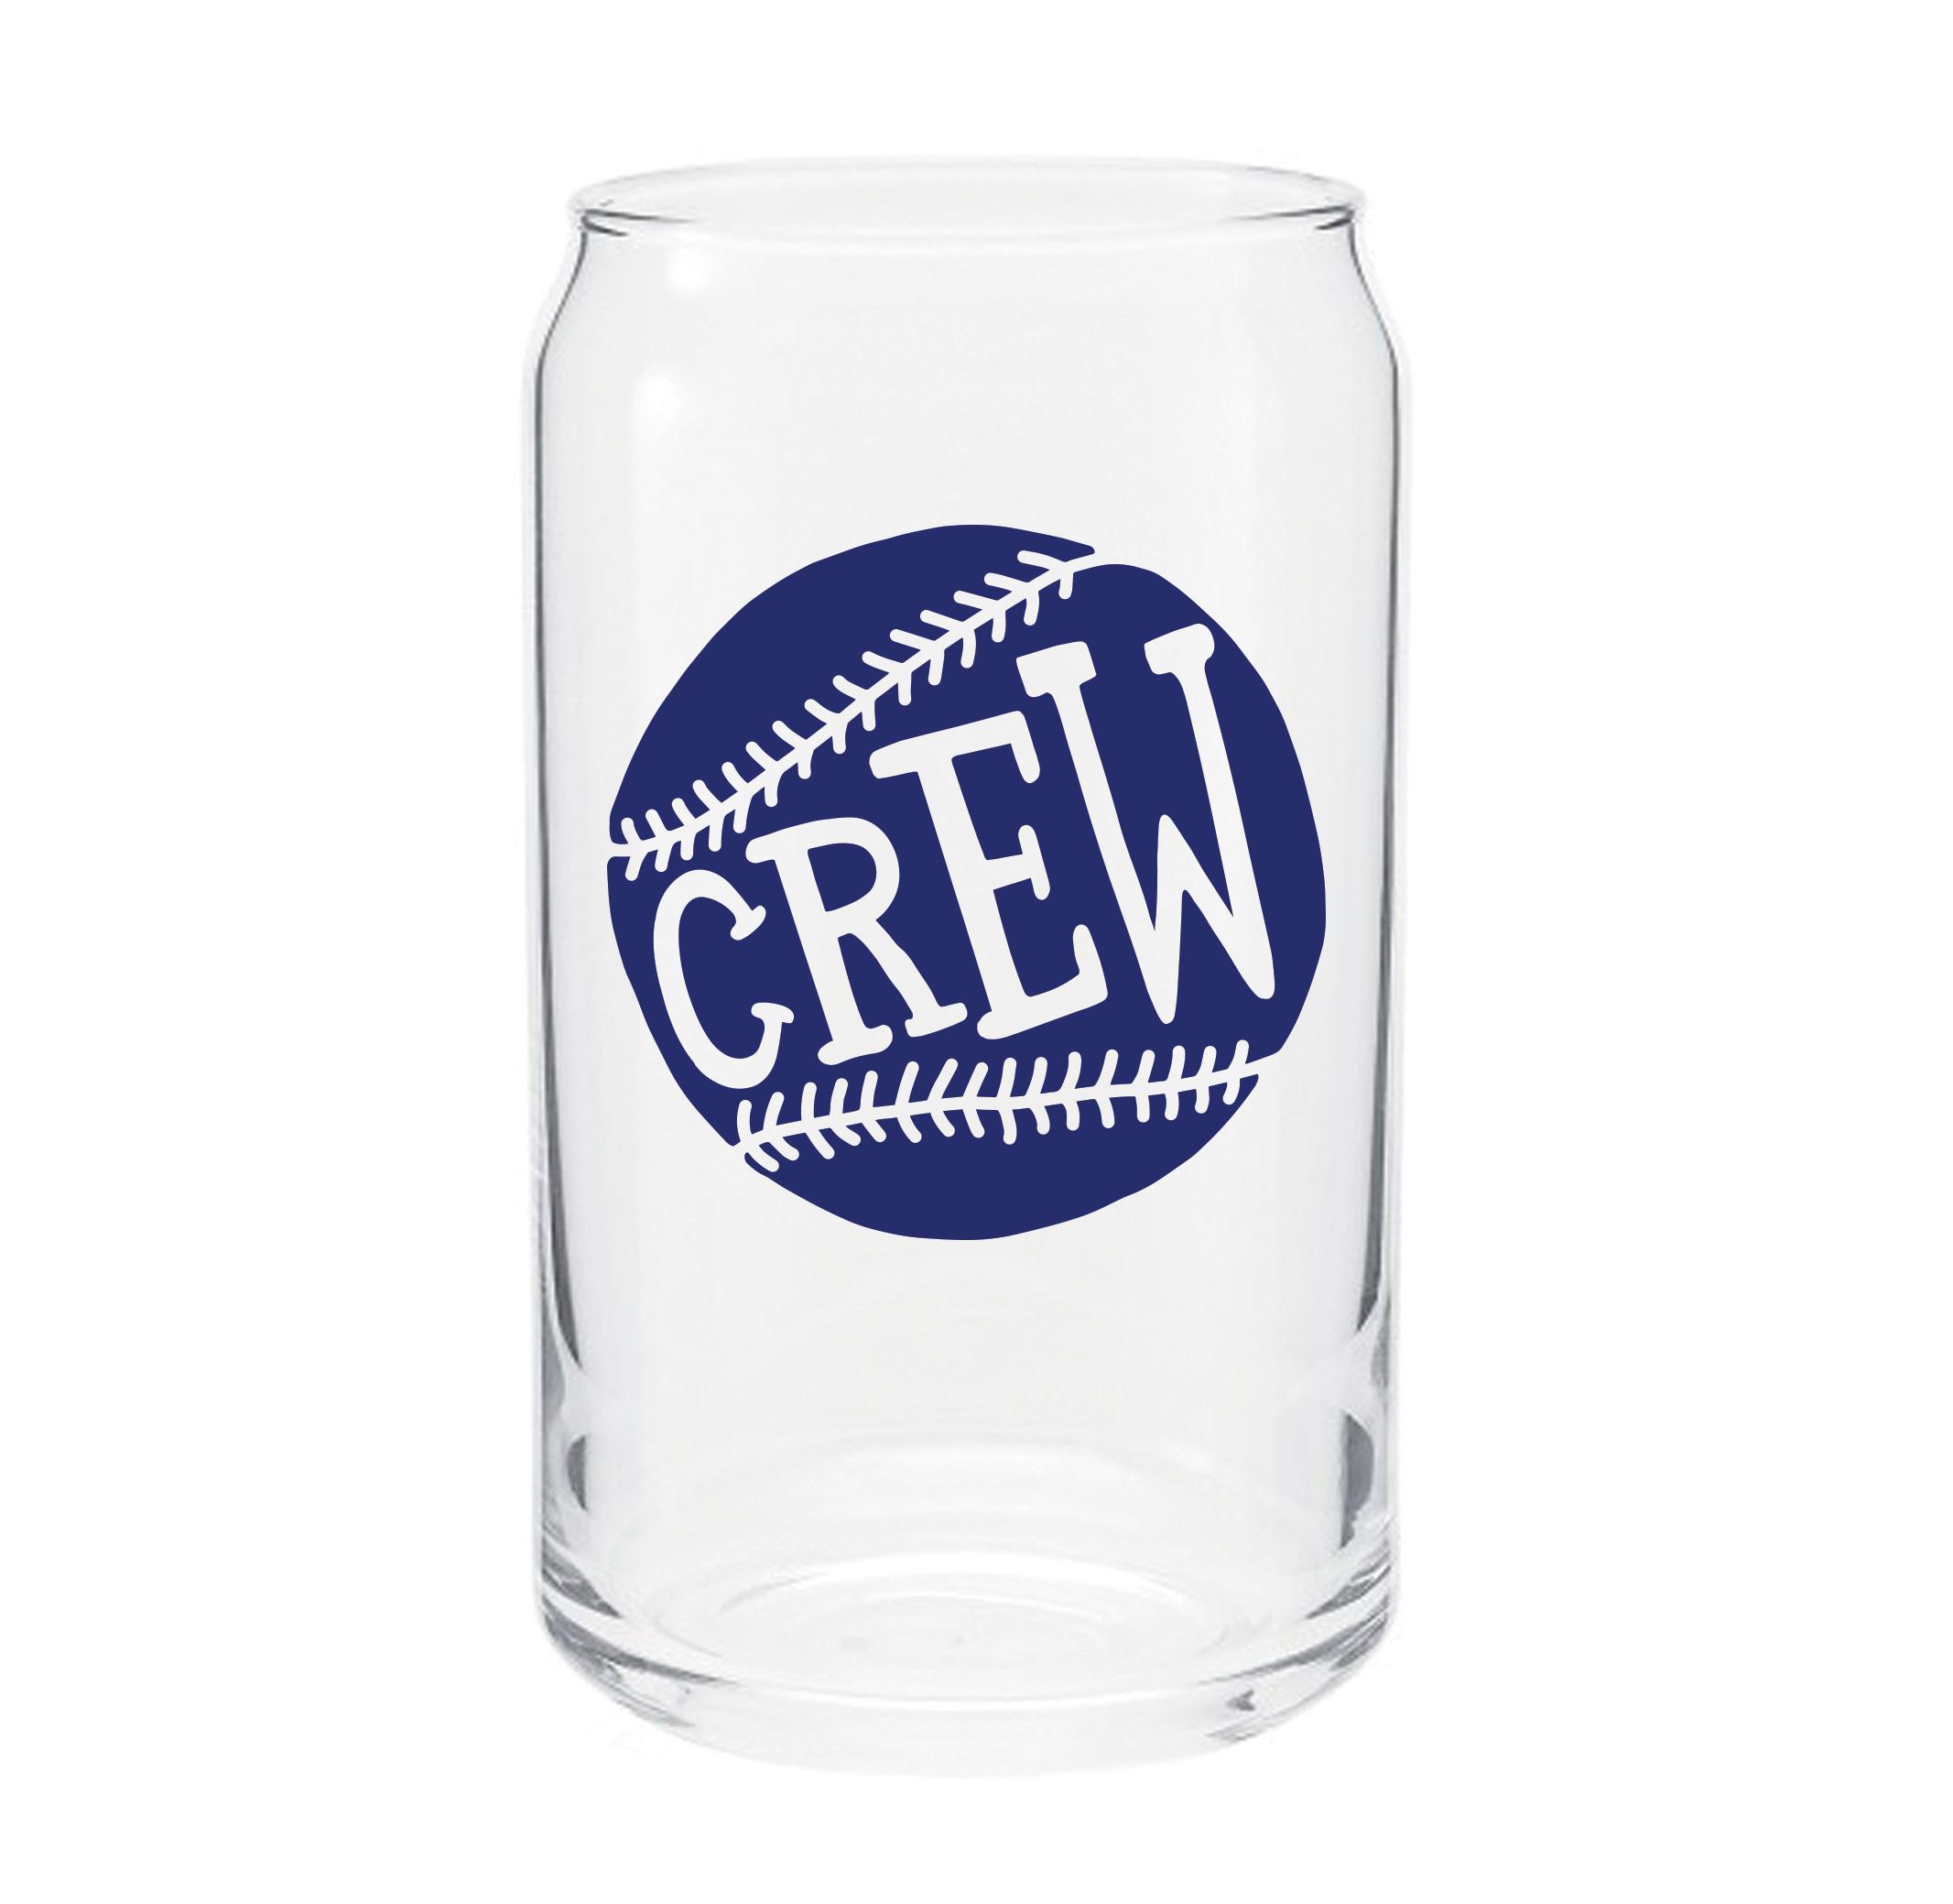 crew-glass-web.jpg